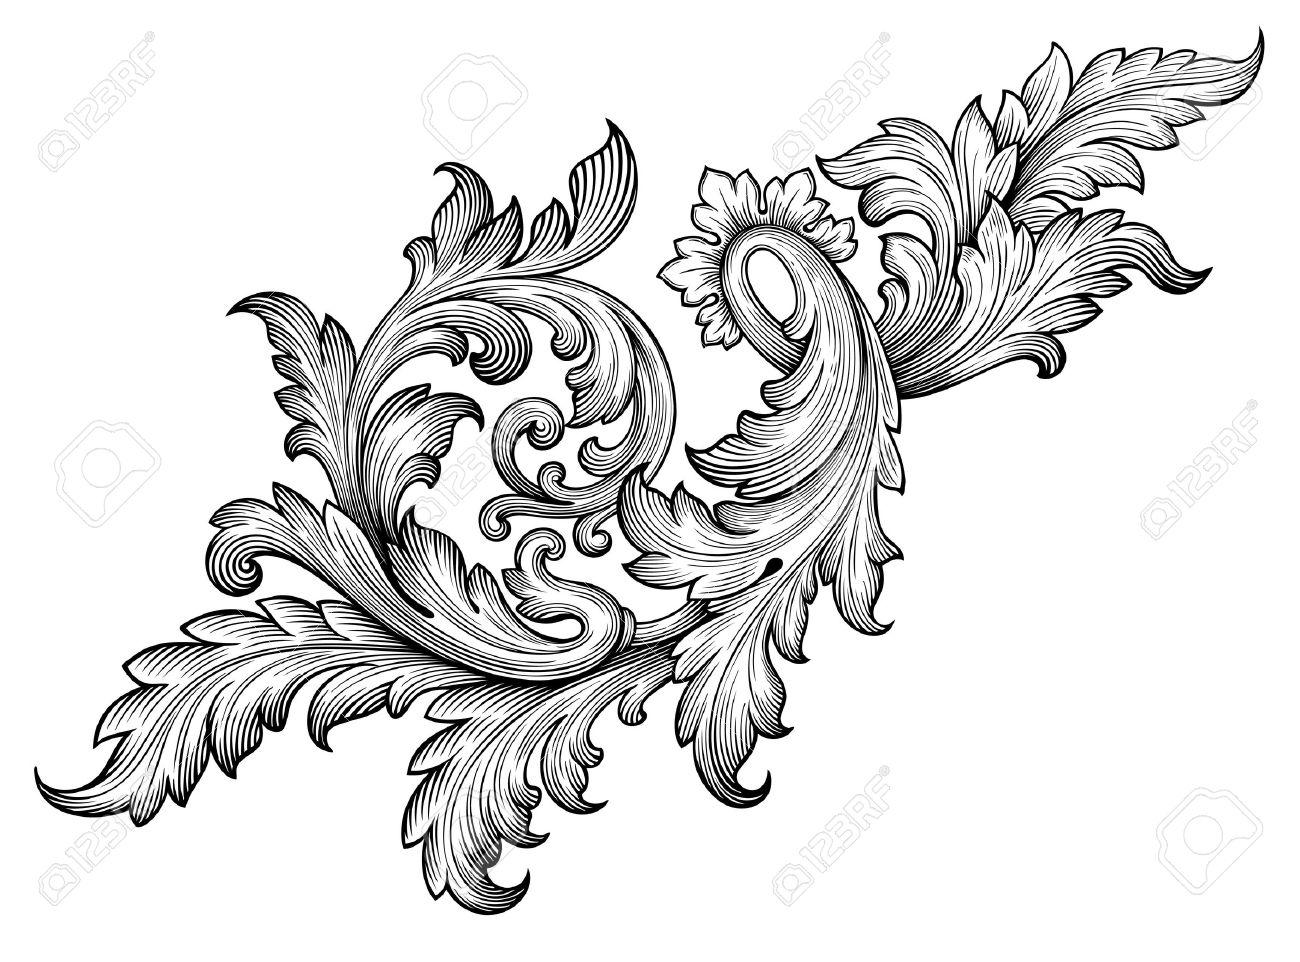 Vintage baroque frame leaf scroll floral ornament engraving border retro pattern antique style swirl decorative design element black and white filigree vector - 36752726